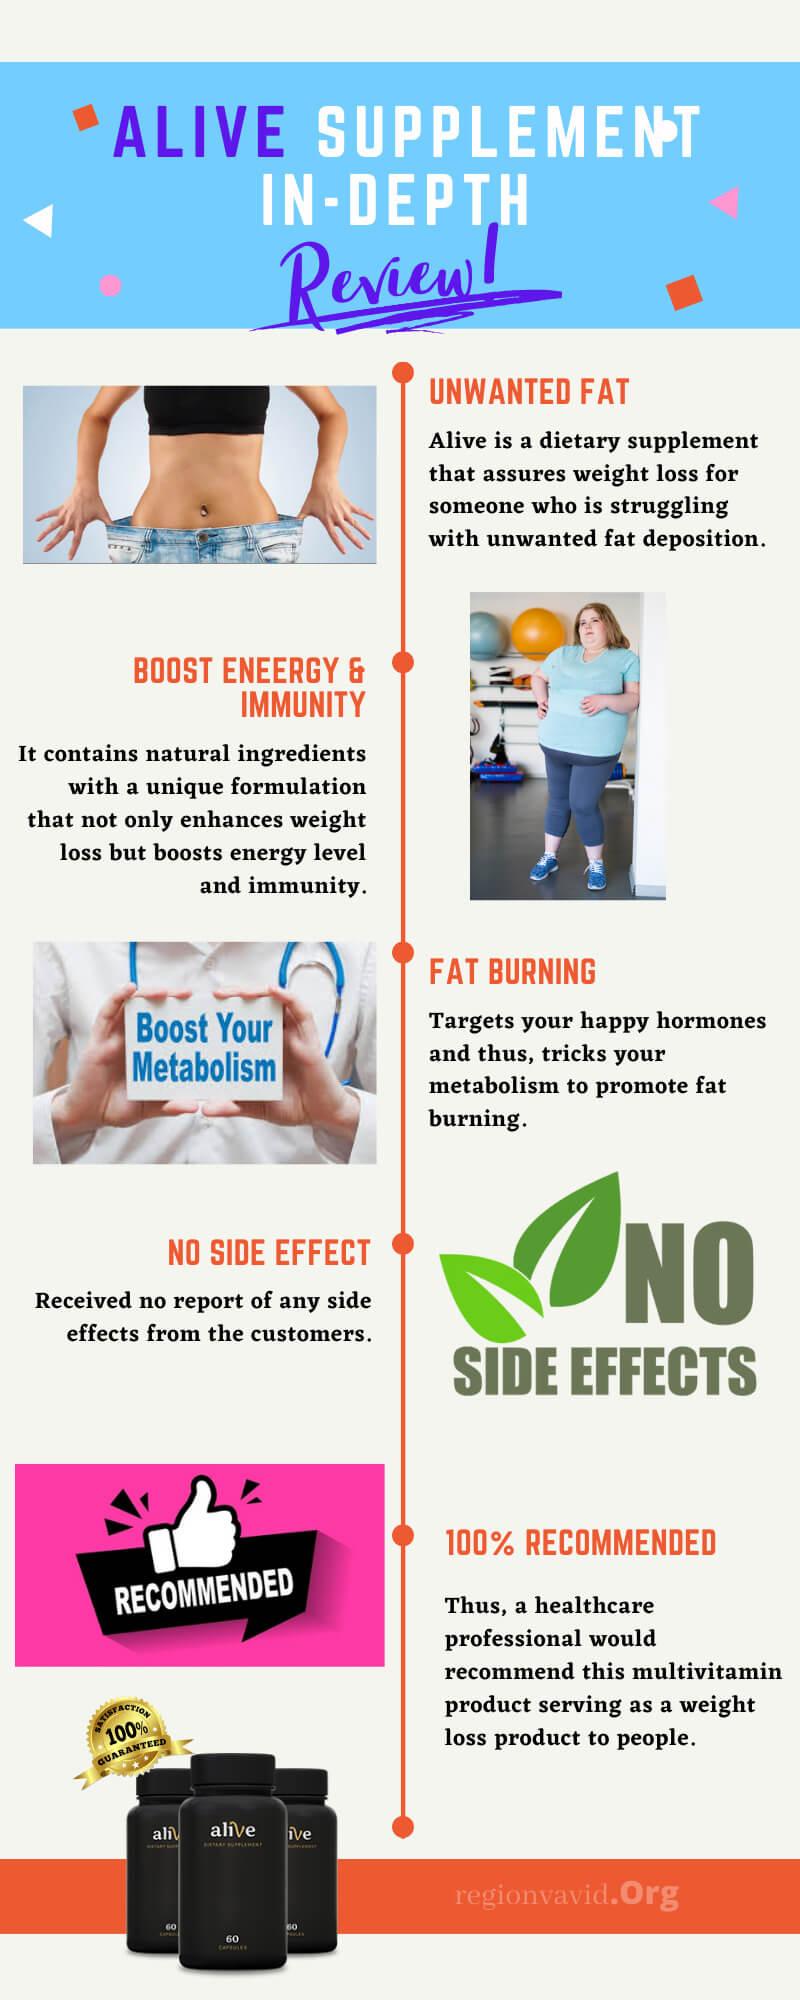 Alive Supplement Benefits Of Taking Pills